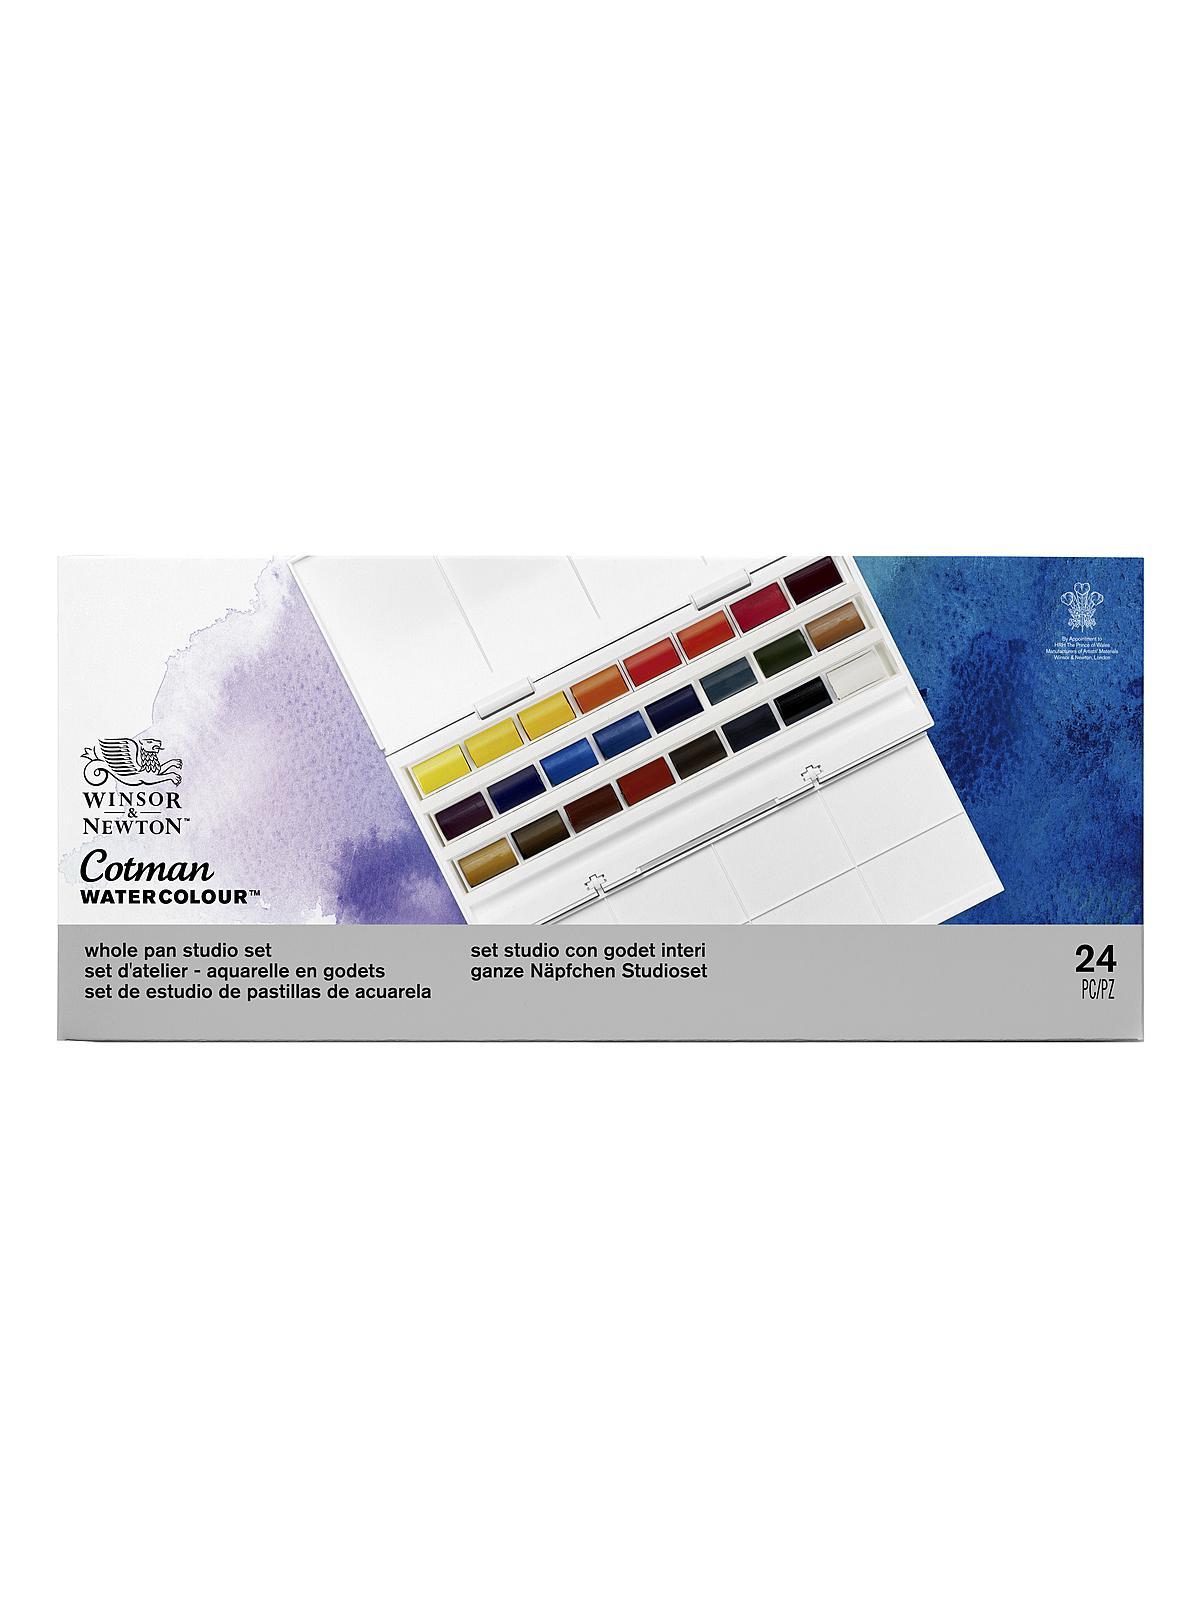 Winsor And Newton Watercolor : winsor, newton, watercolor, Winsor, Newton, Cotman, Water, Colour, Studio, MisterArt.com